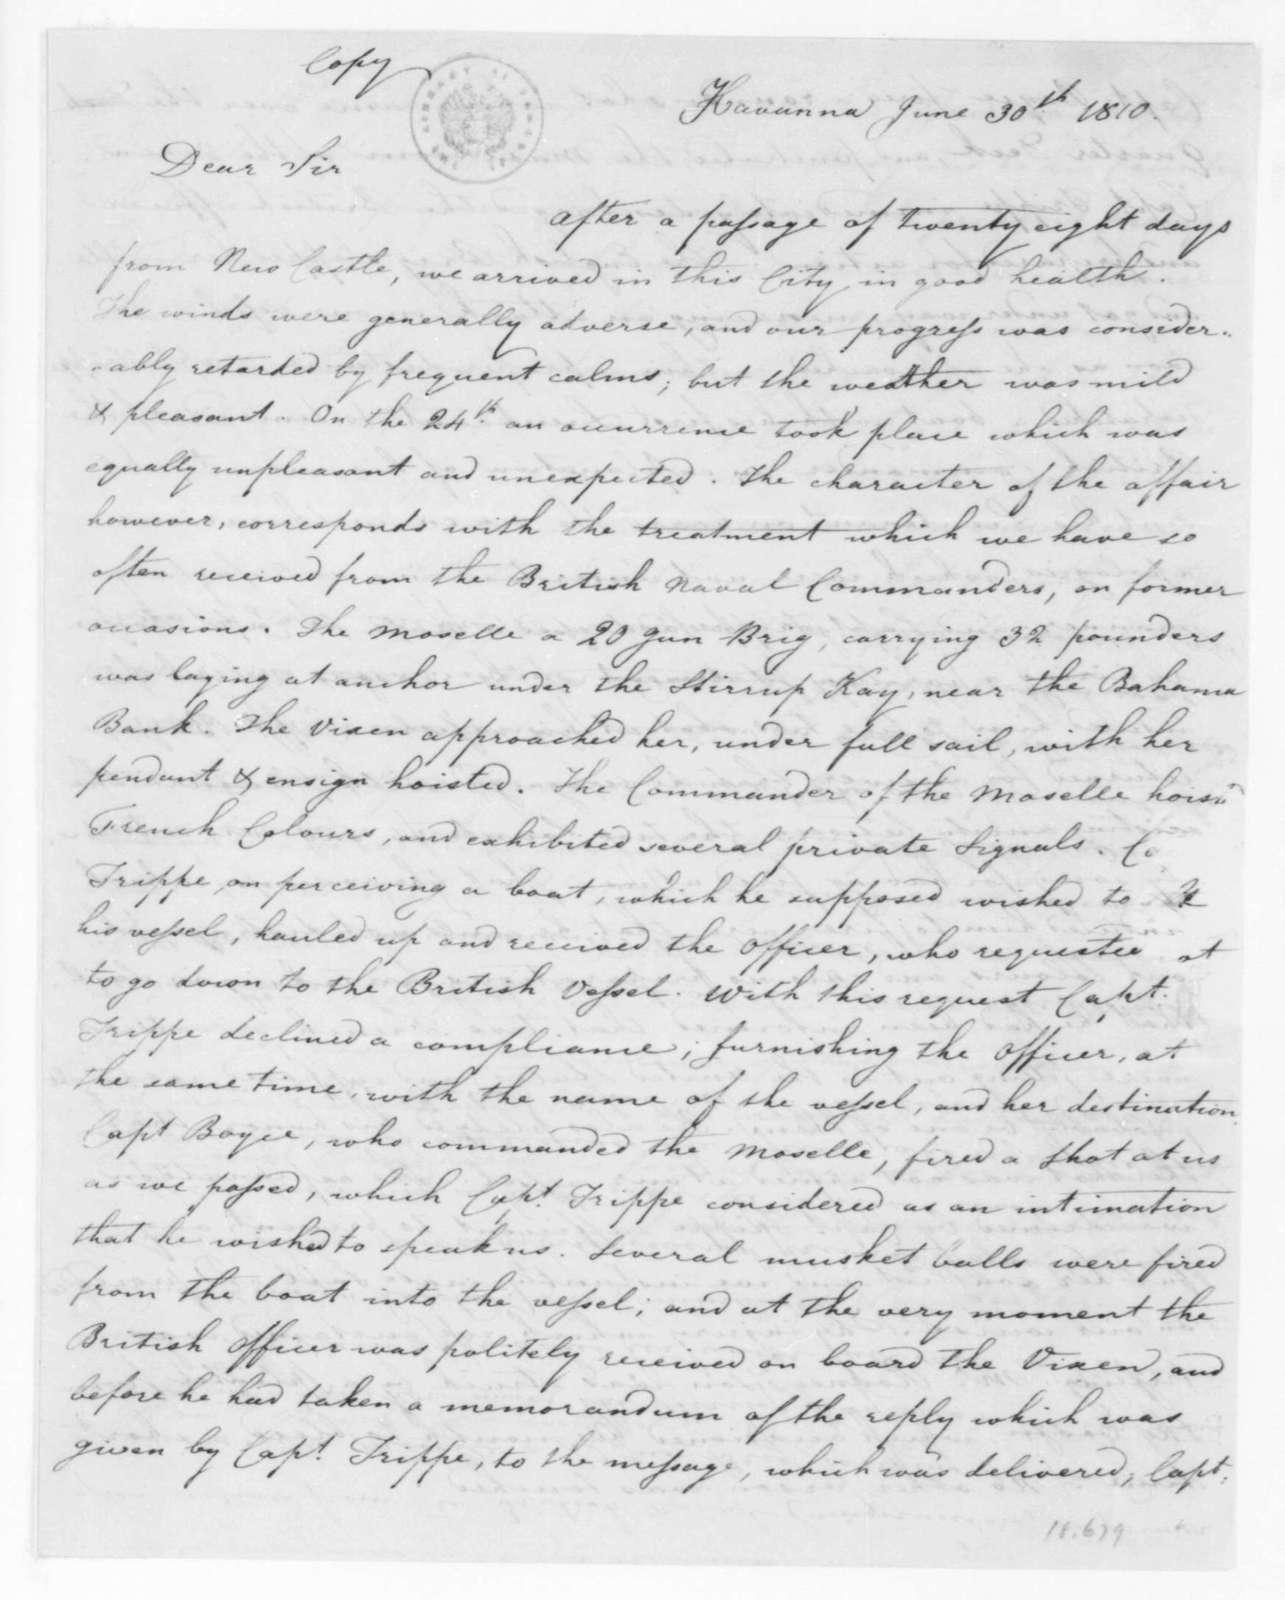 George Poindexter to Paul Hamilton, June 30, 1810.